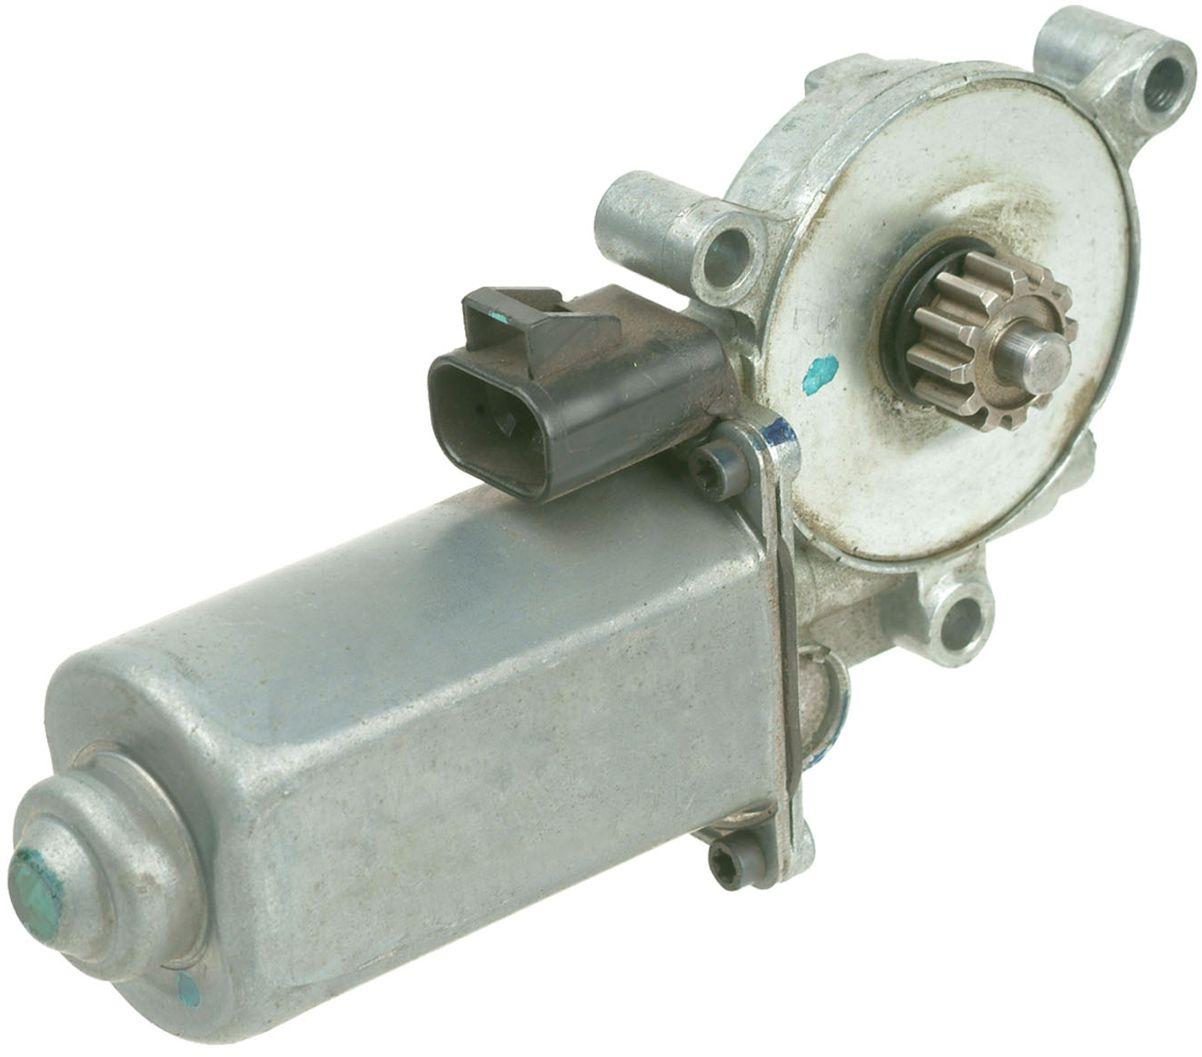 Online Automotive MGTF18 5004A-OLACU1120 Premium Ignition Coil Set